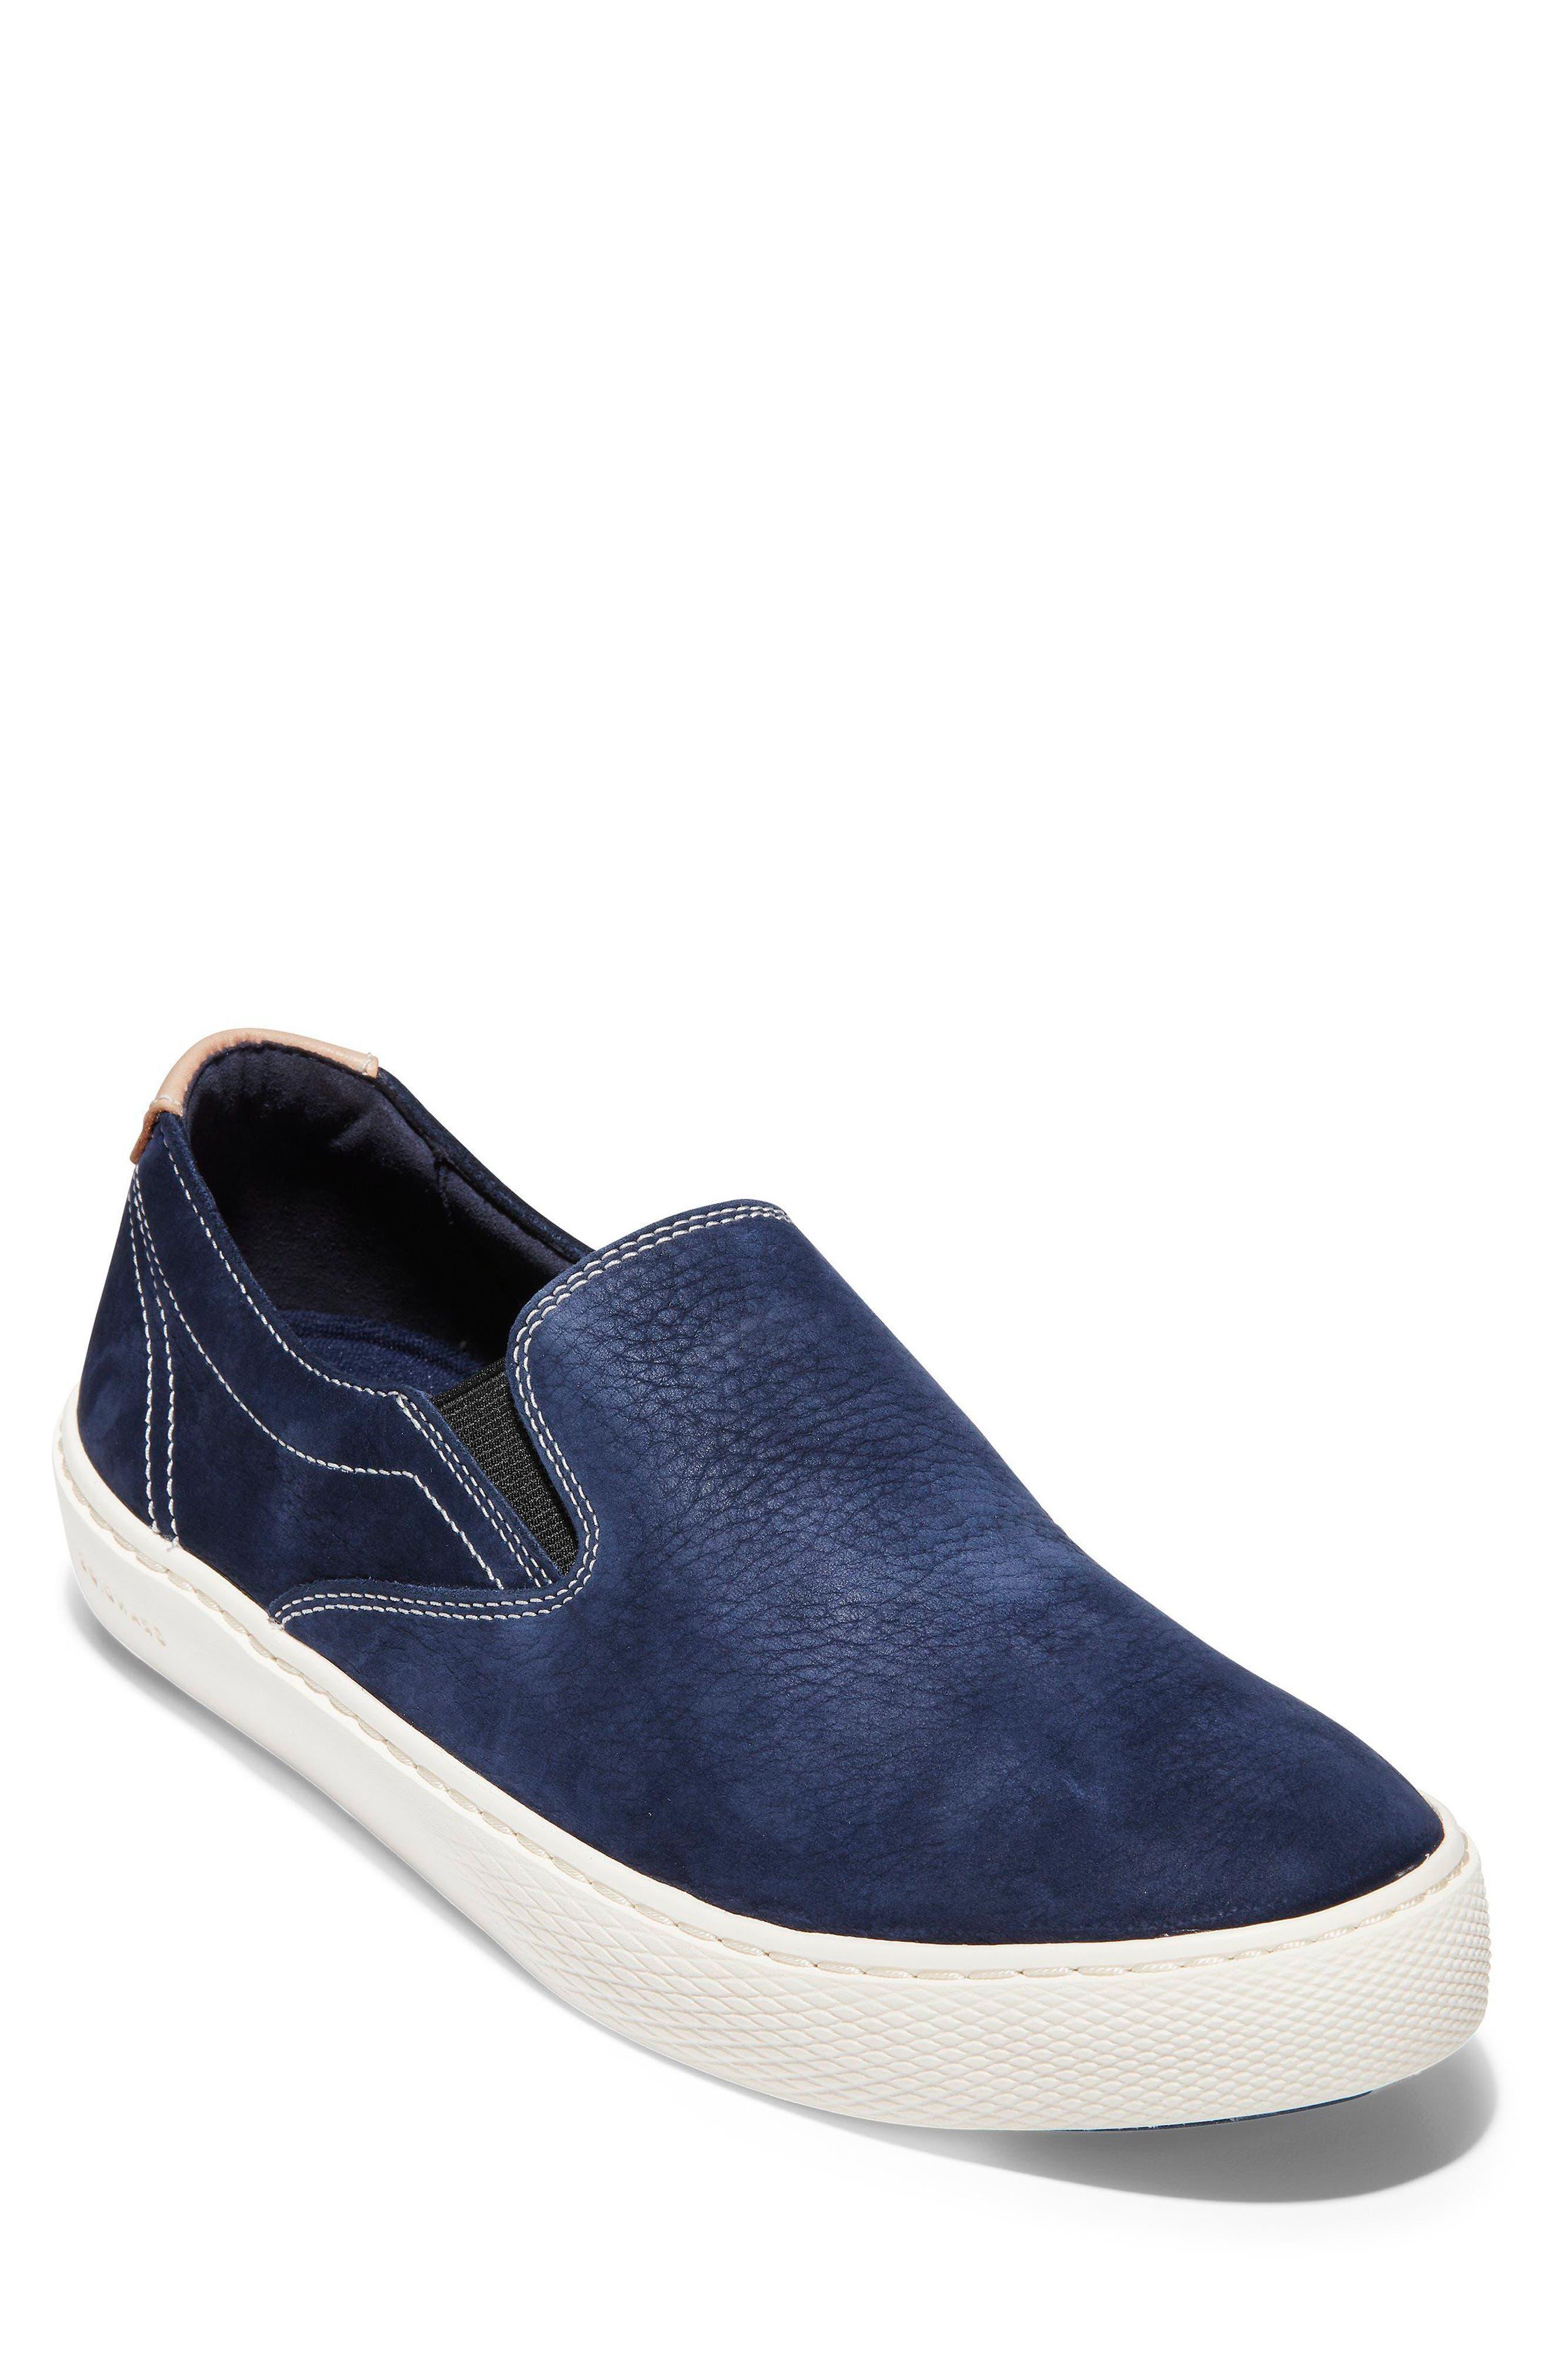 GrandPrø Deck Slip-On Sneaker,                             Main thumbnail 1, color,                             Marine Blue Nubuck